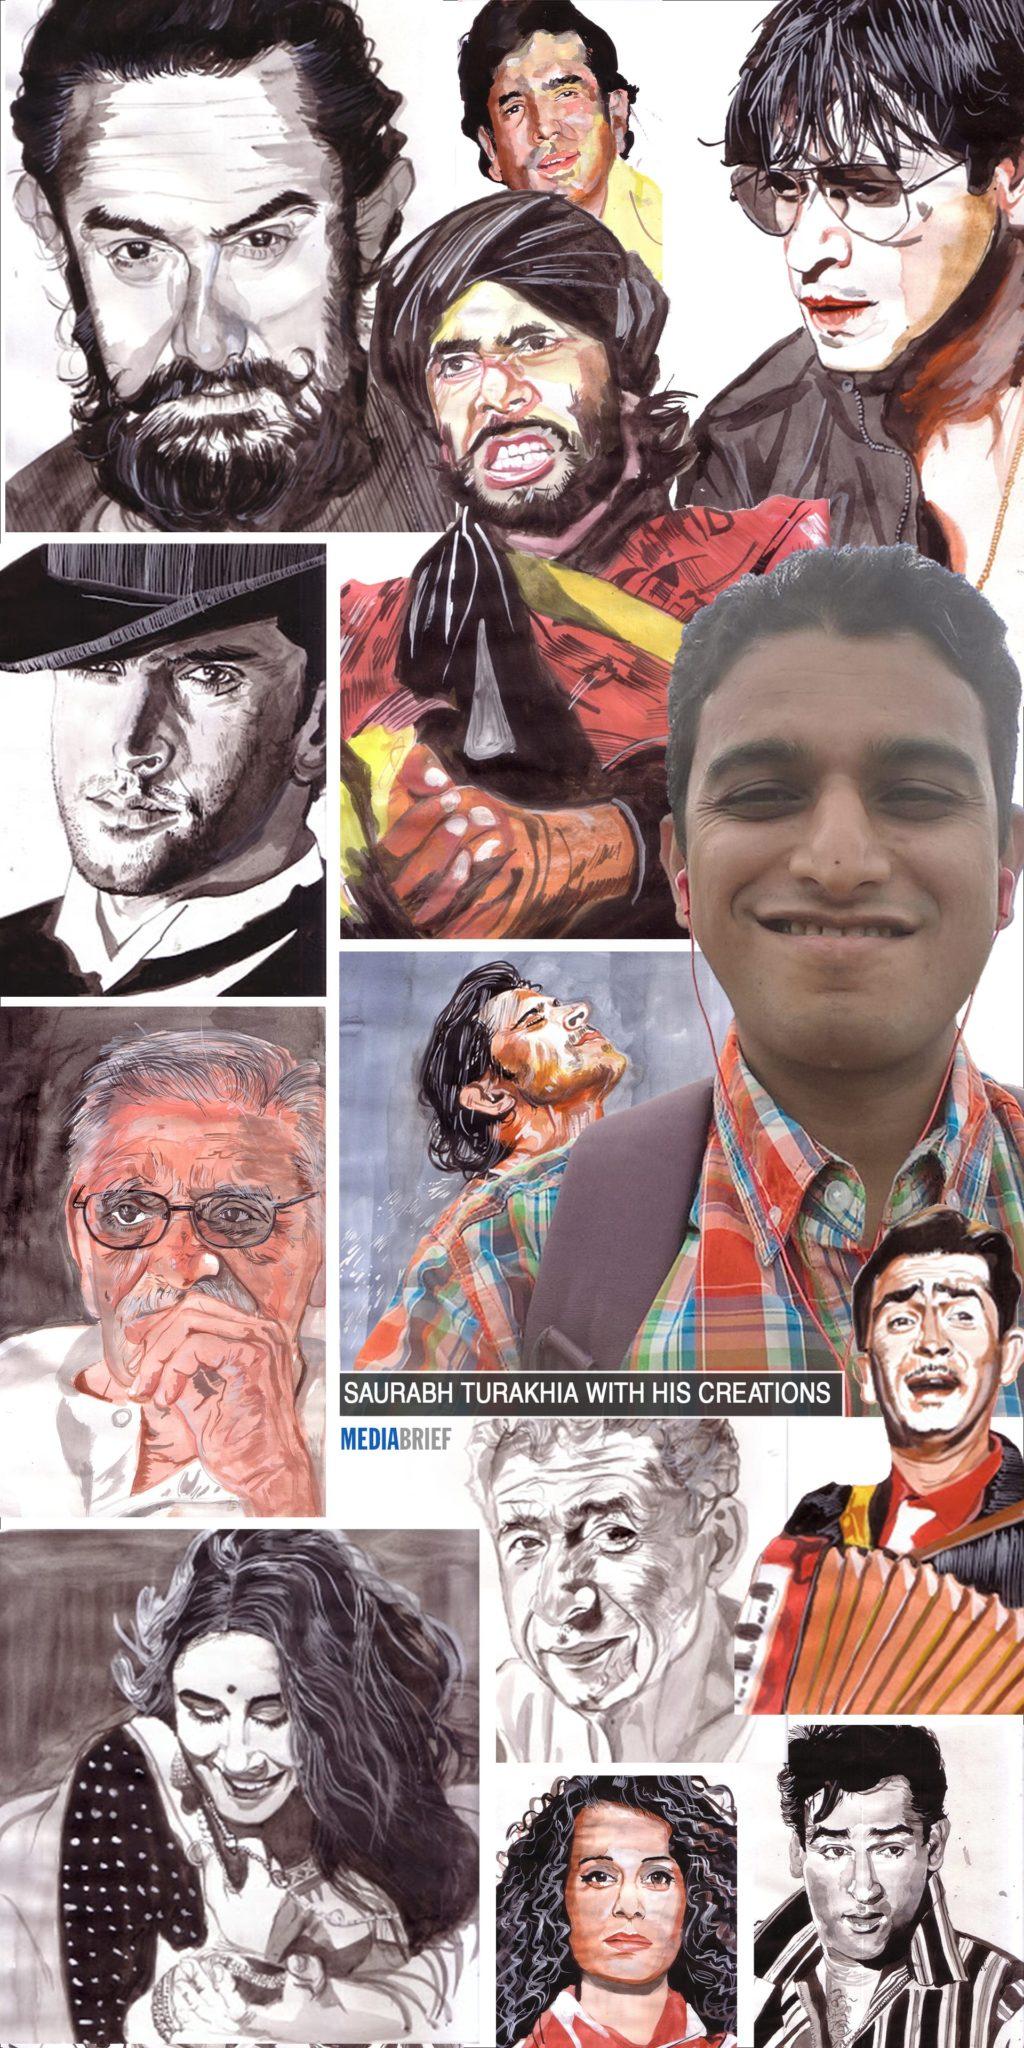 image-Saurabh-Turakhias-passion-for-celebrity-portraits-mediabrief